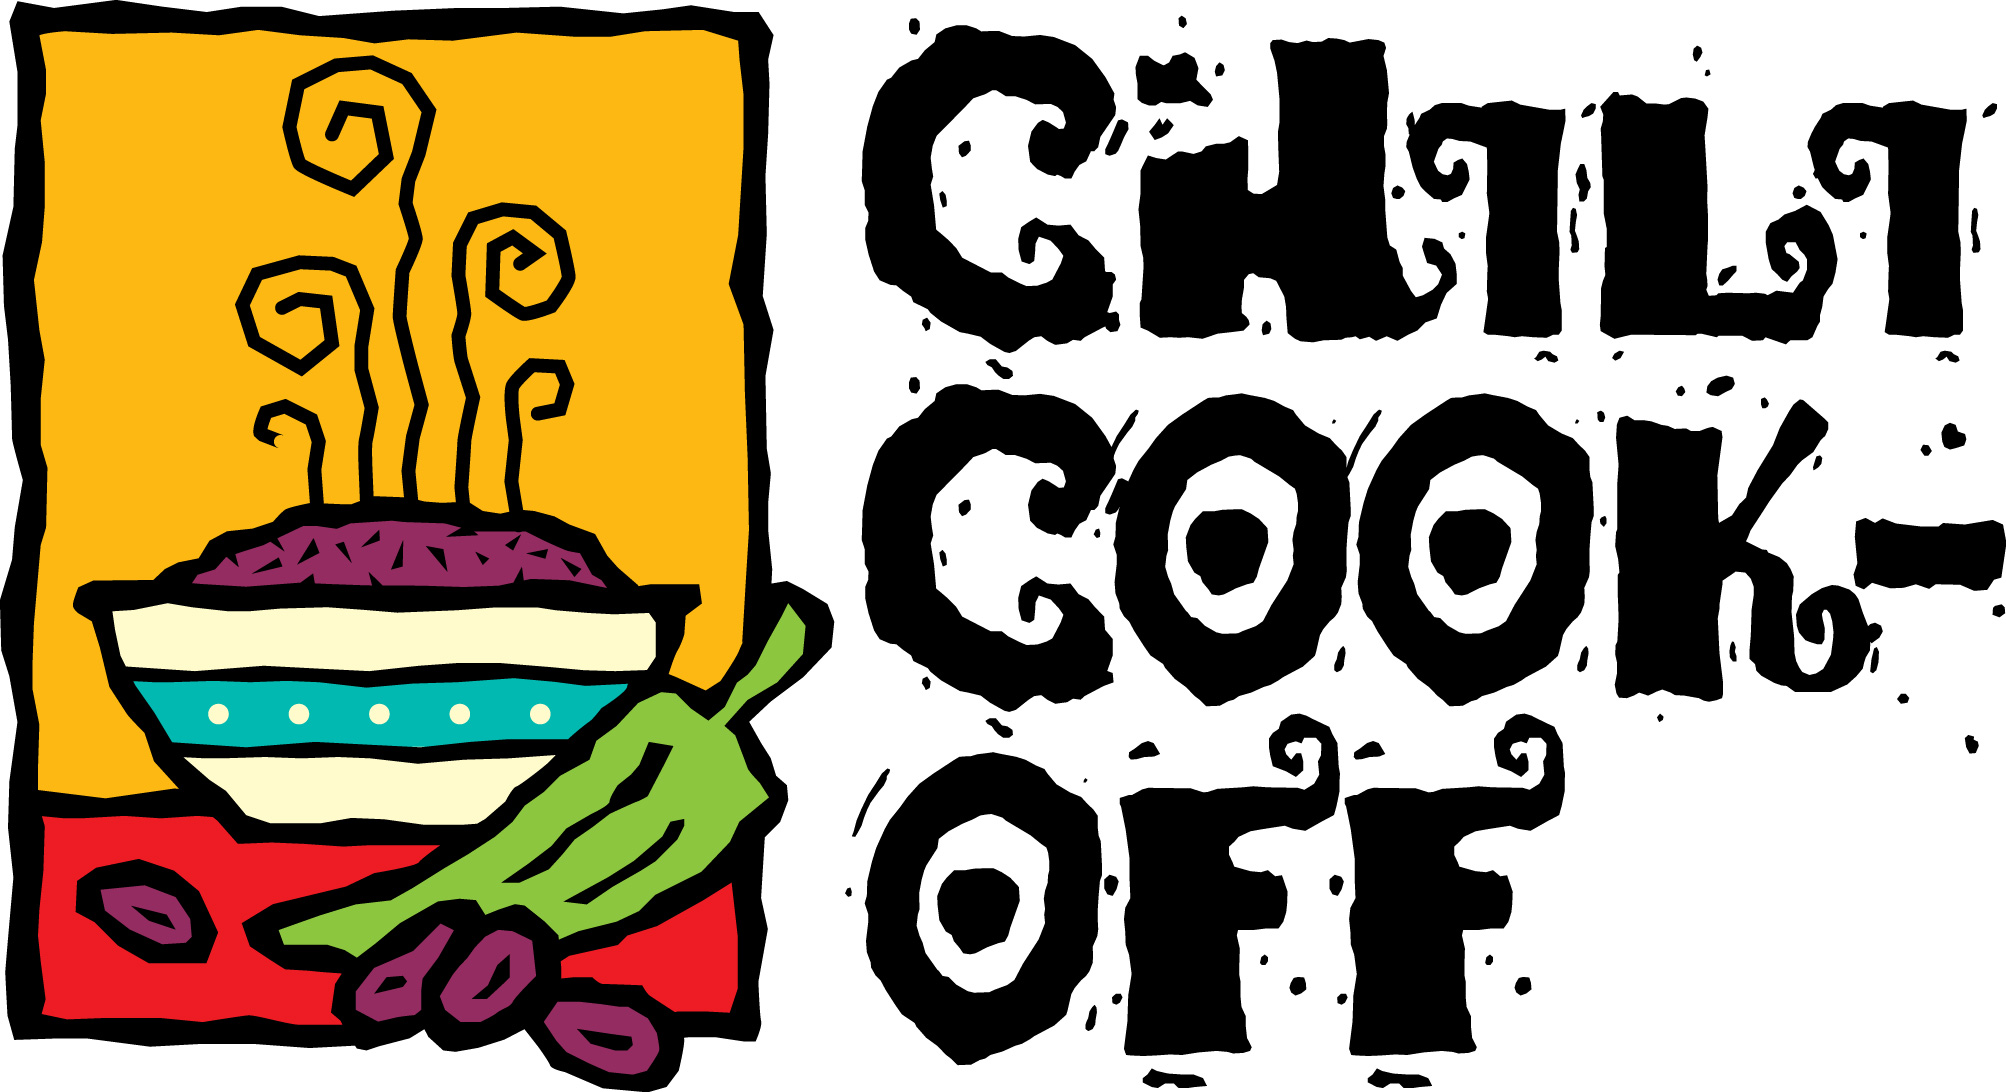 Free clip art chili cook off dromgfo top image #29368.